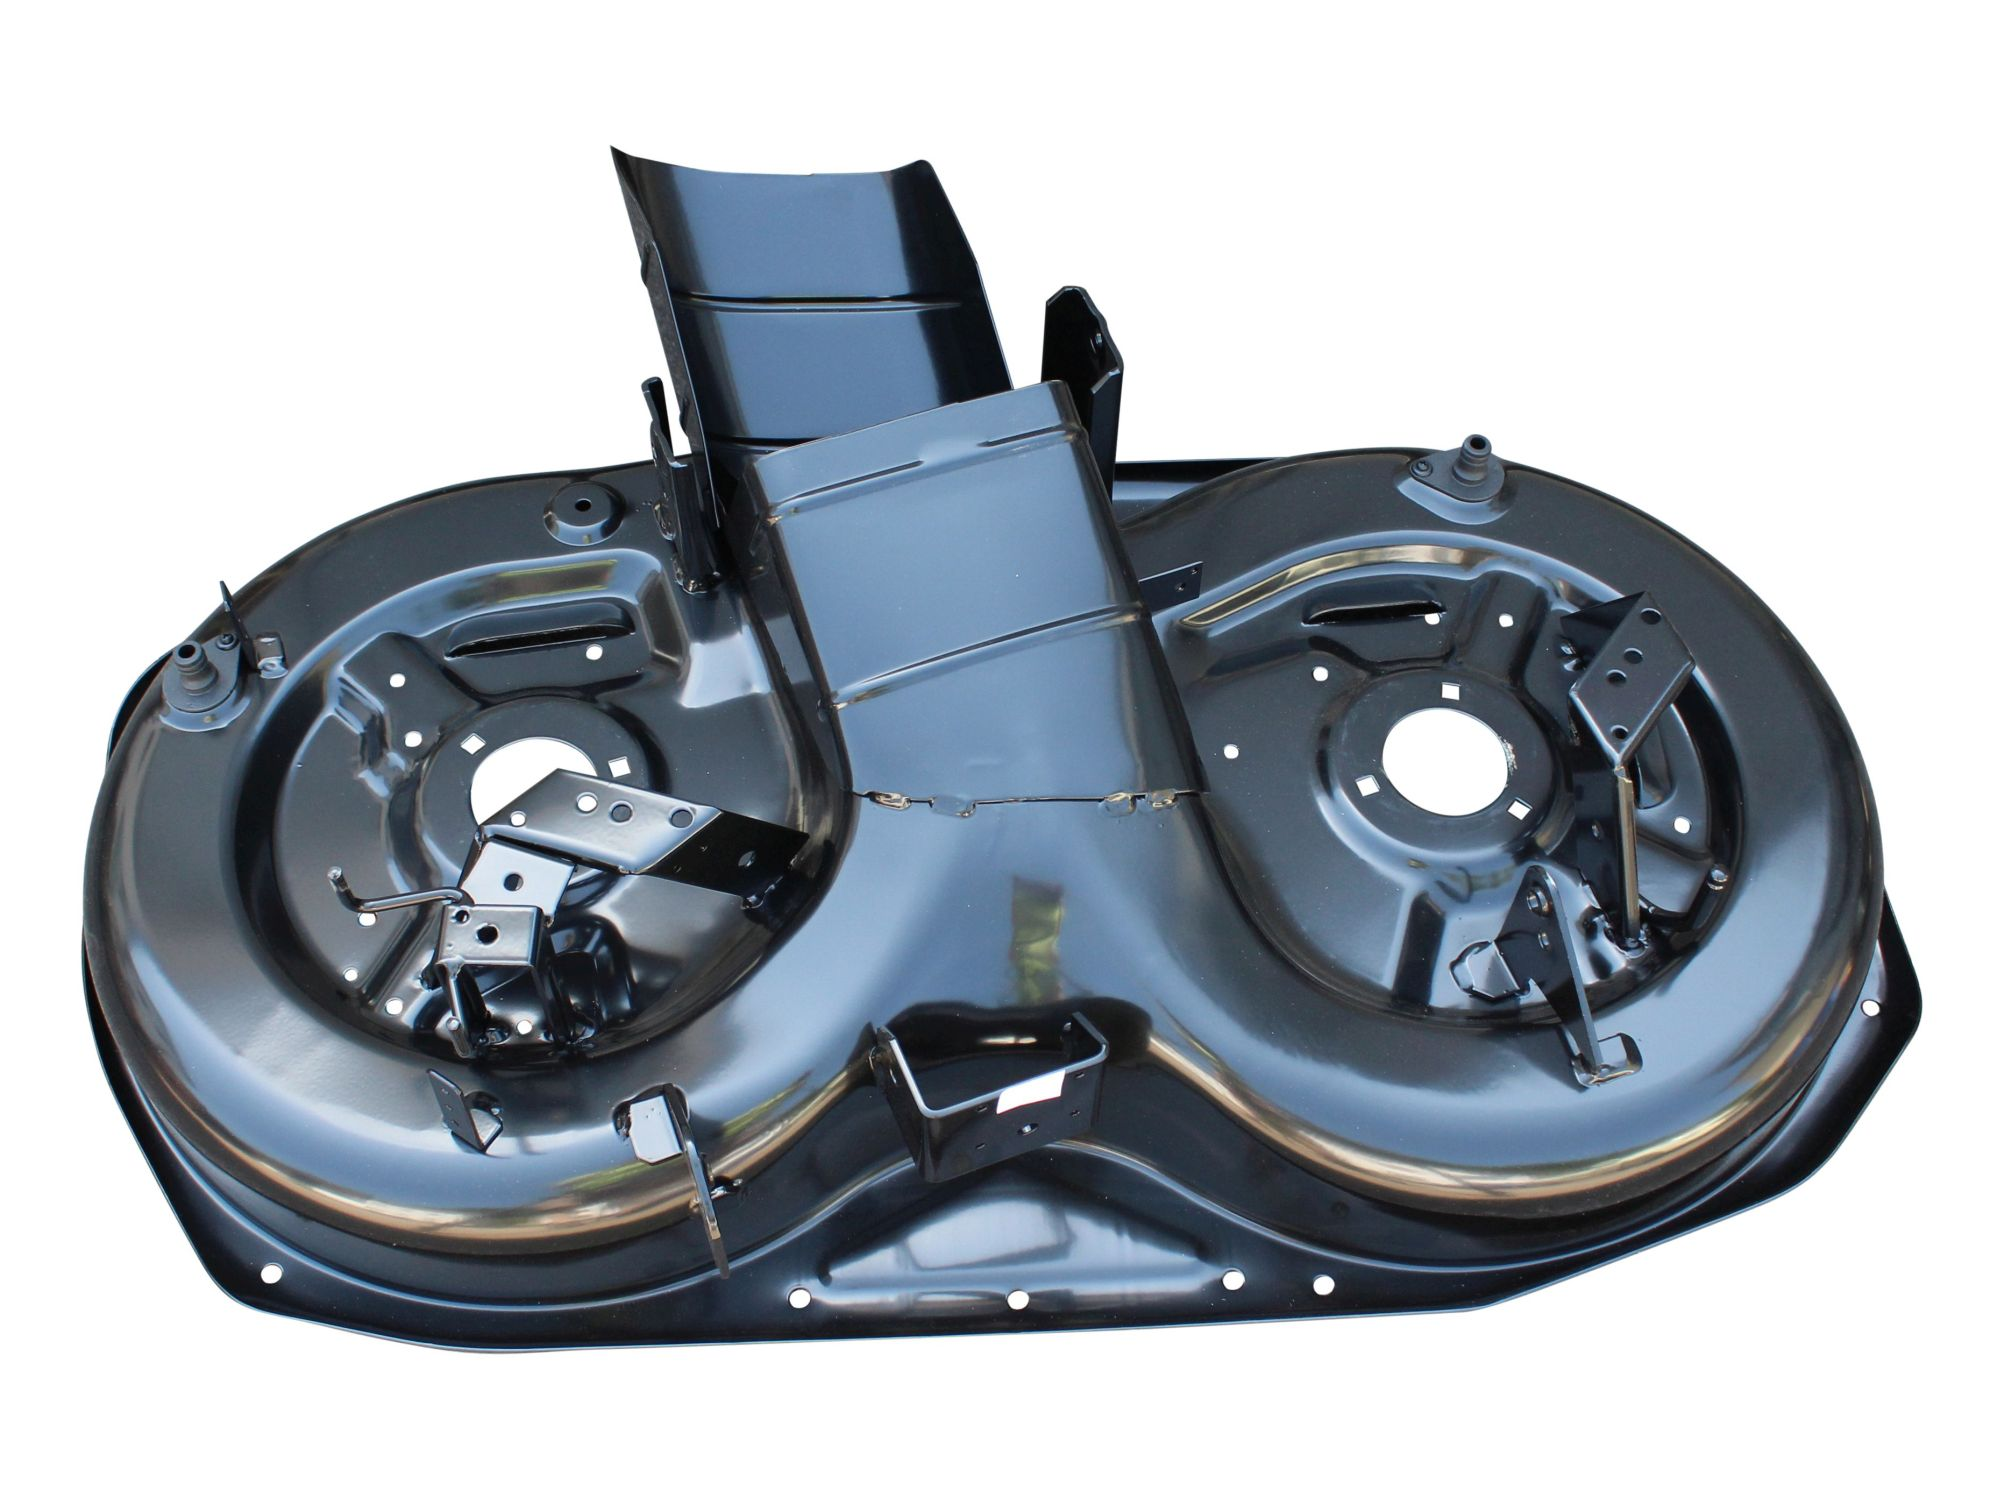 Messersatz passend Viking MT785S Heckauswurf Rasentraktor